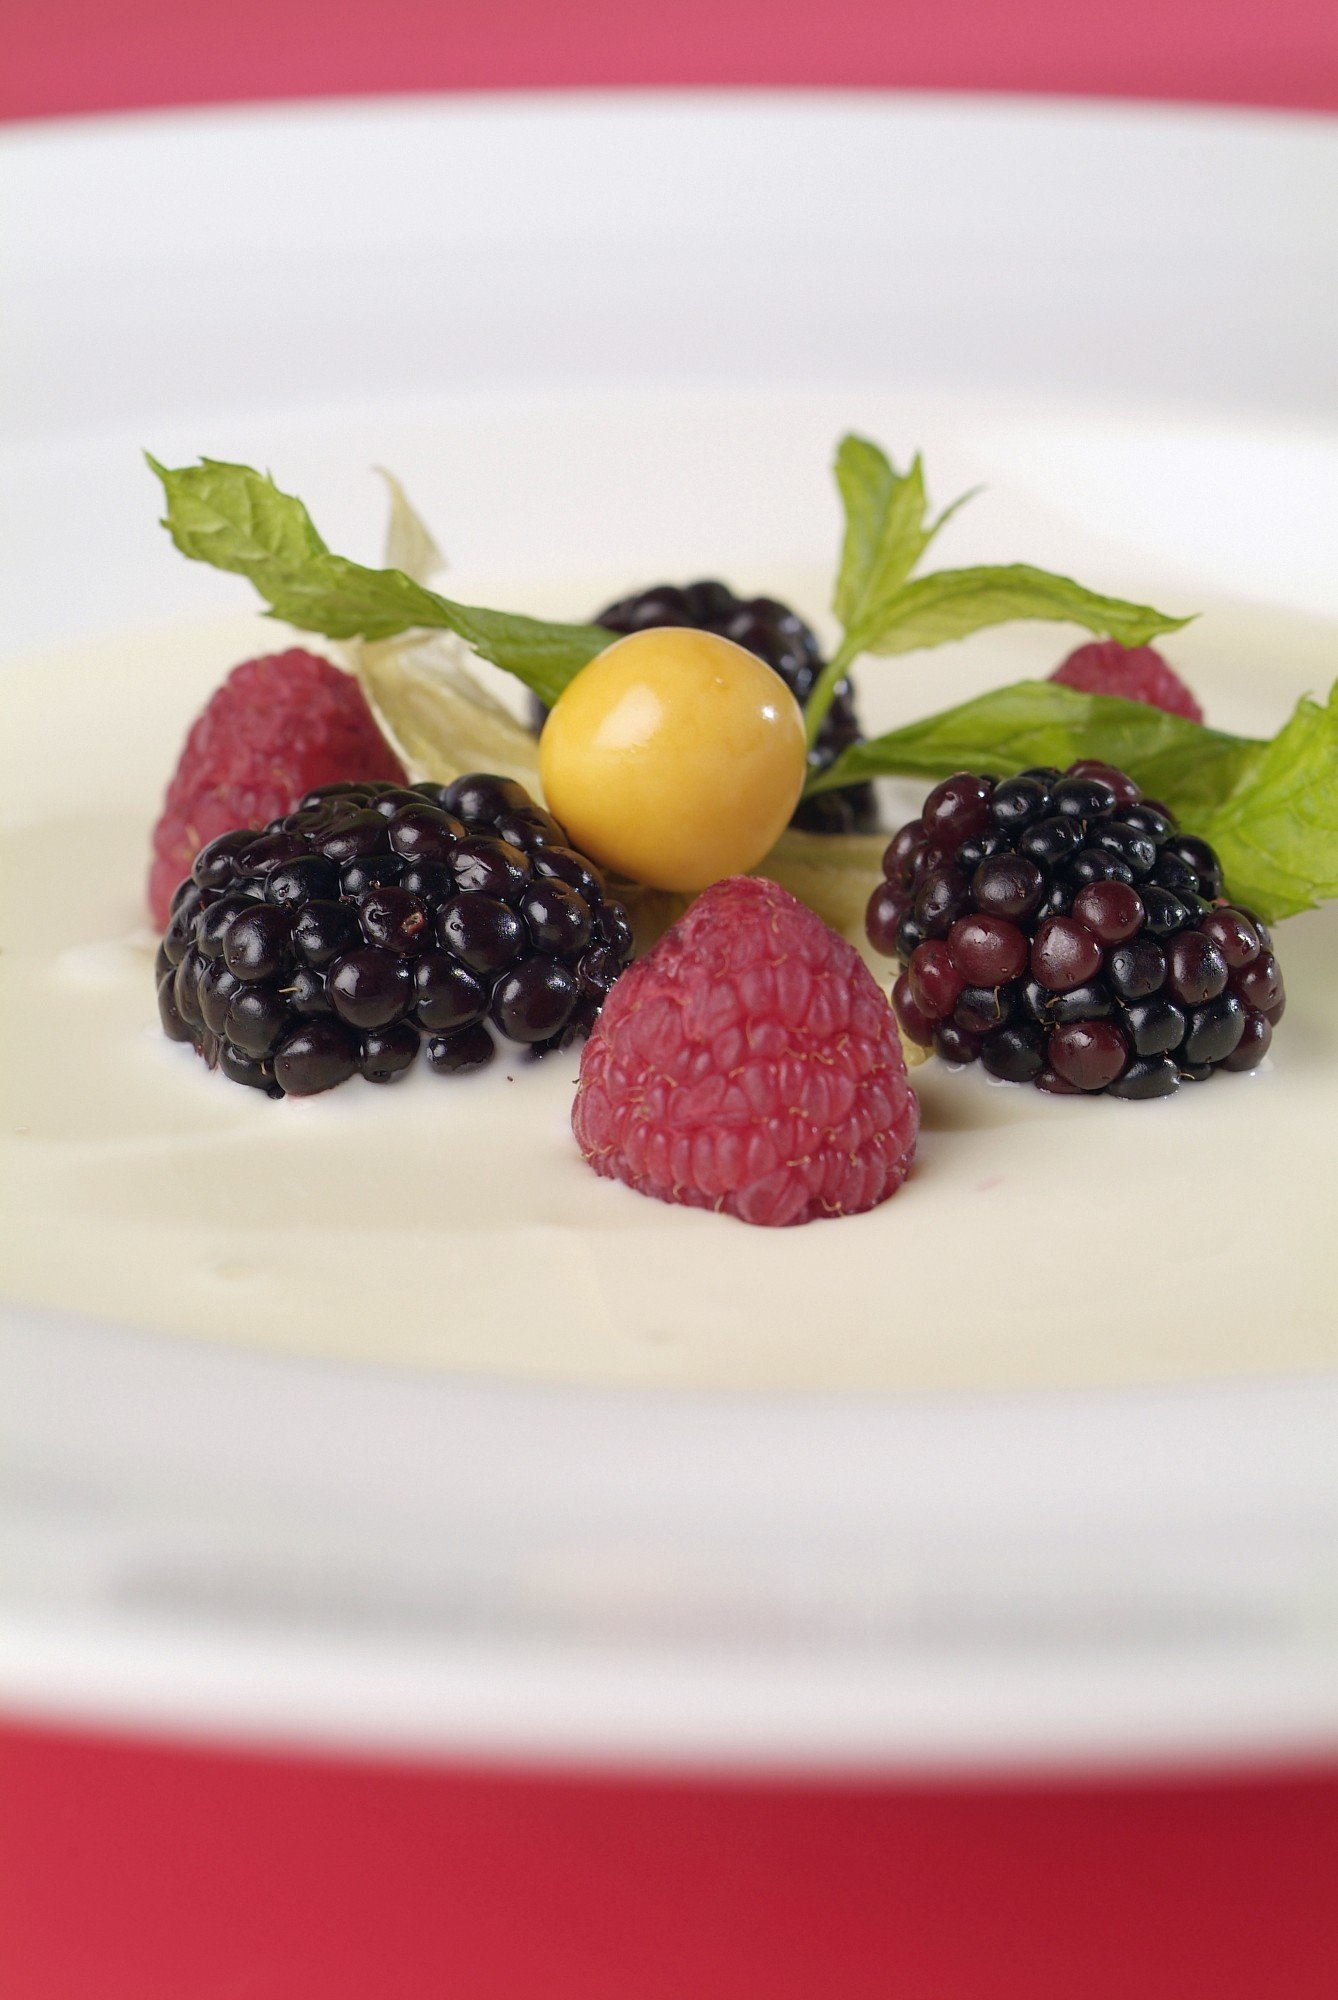 food|FOOD|Dishes|Fruit|Chocolate|Dessert|Mint,